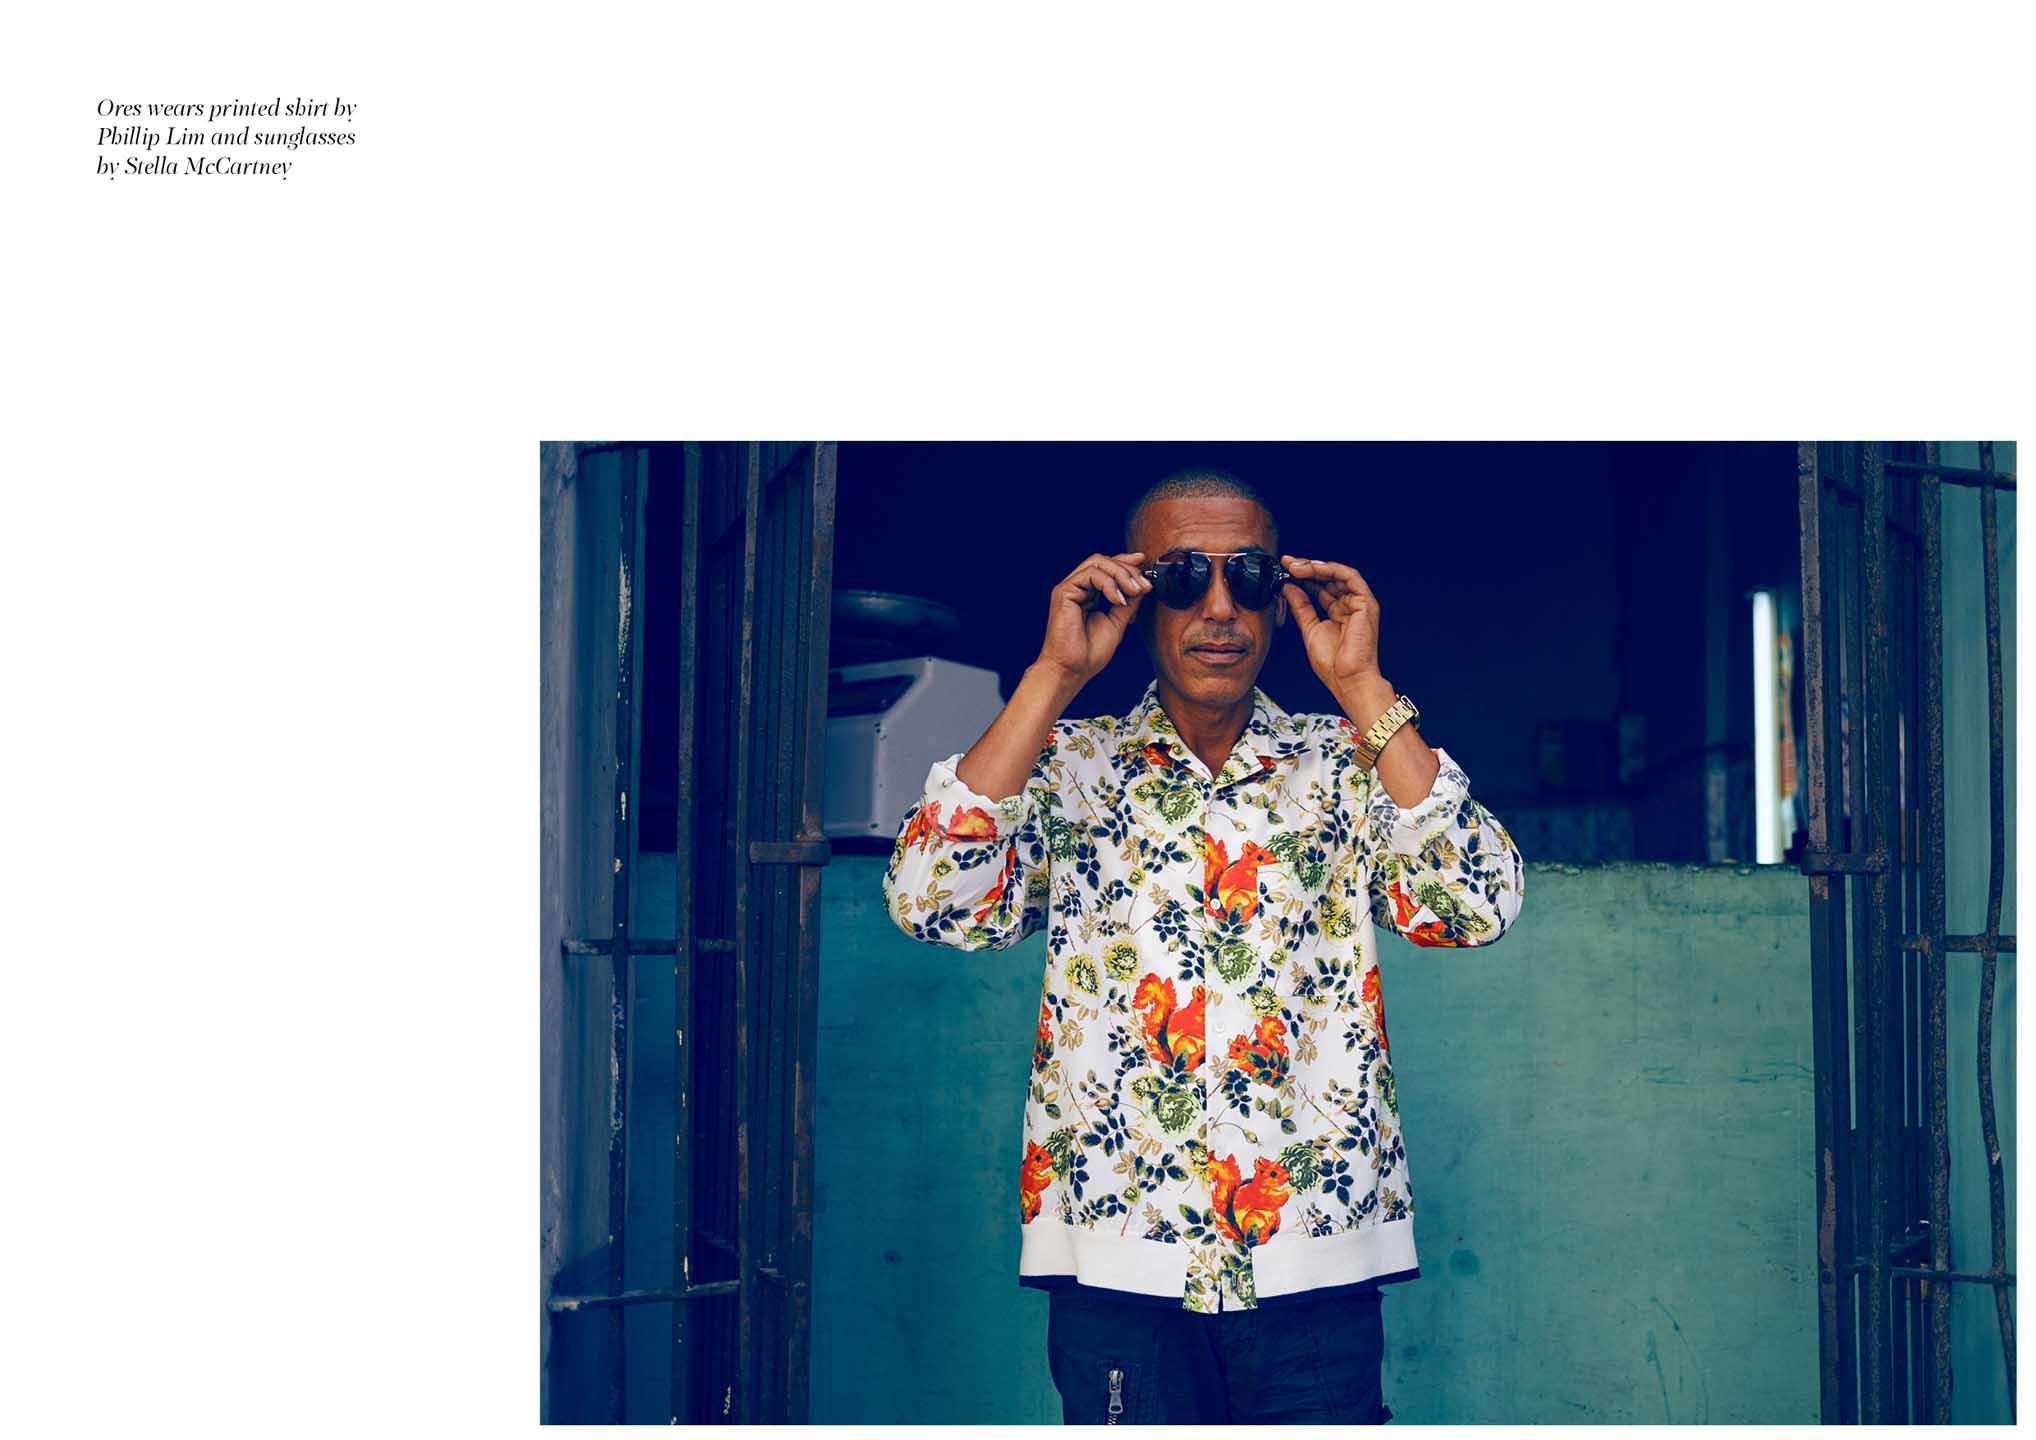 Mens Fashion Story - Make Magazine - Havana Cuba I Greg Sorensen I Fashion & Beauty Photographer I NYC